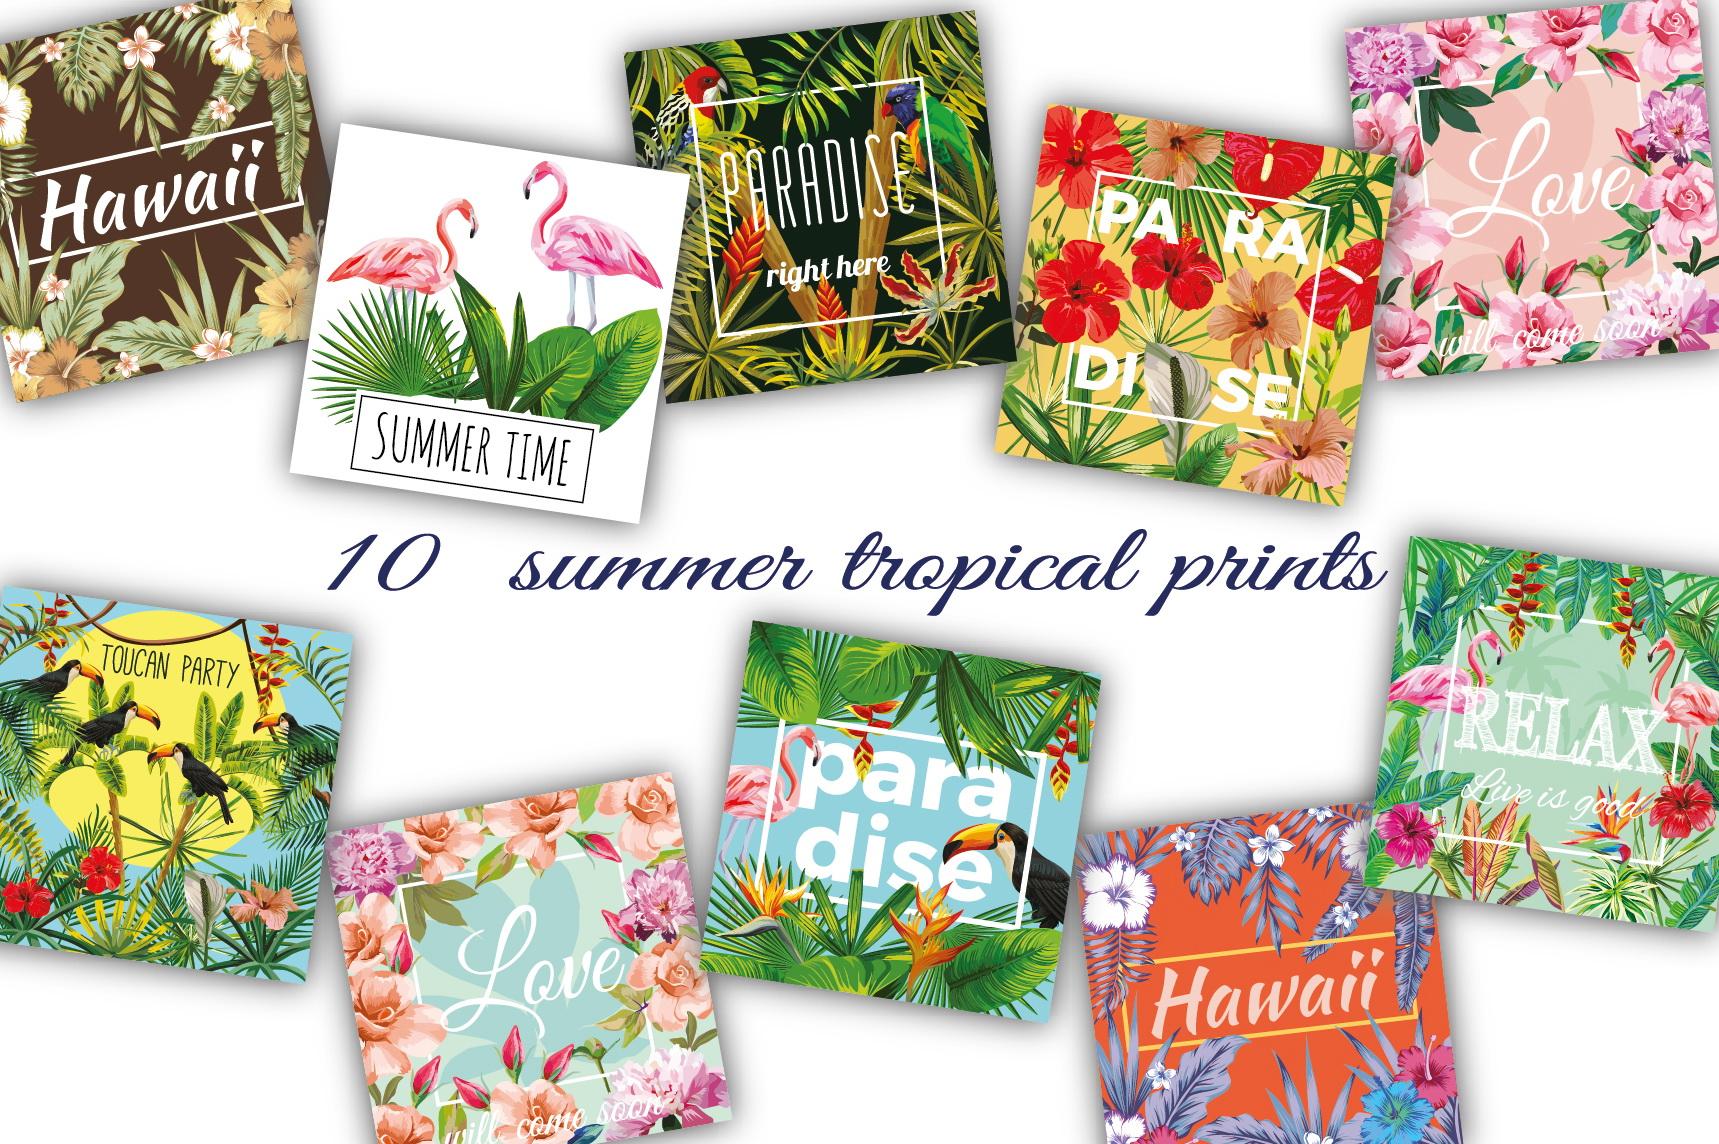 Summer slogan tropical prints example image 1